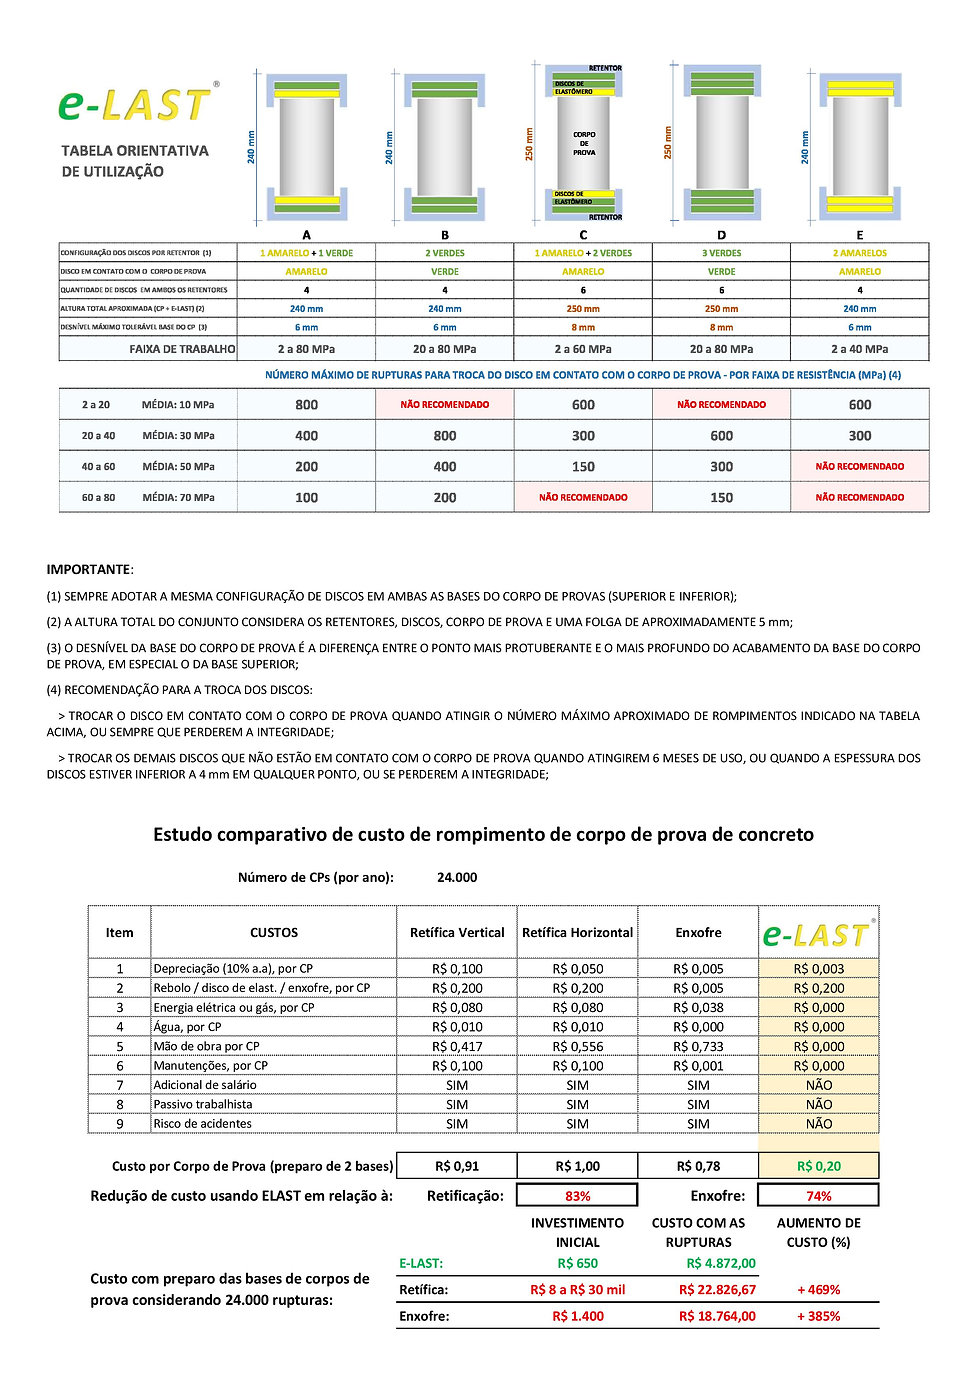 E-Last - Folheto descritivo - 01_02_03_2